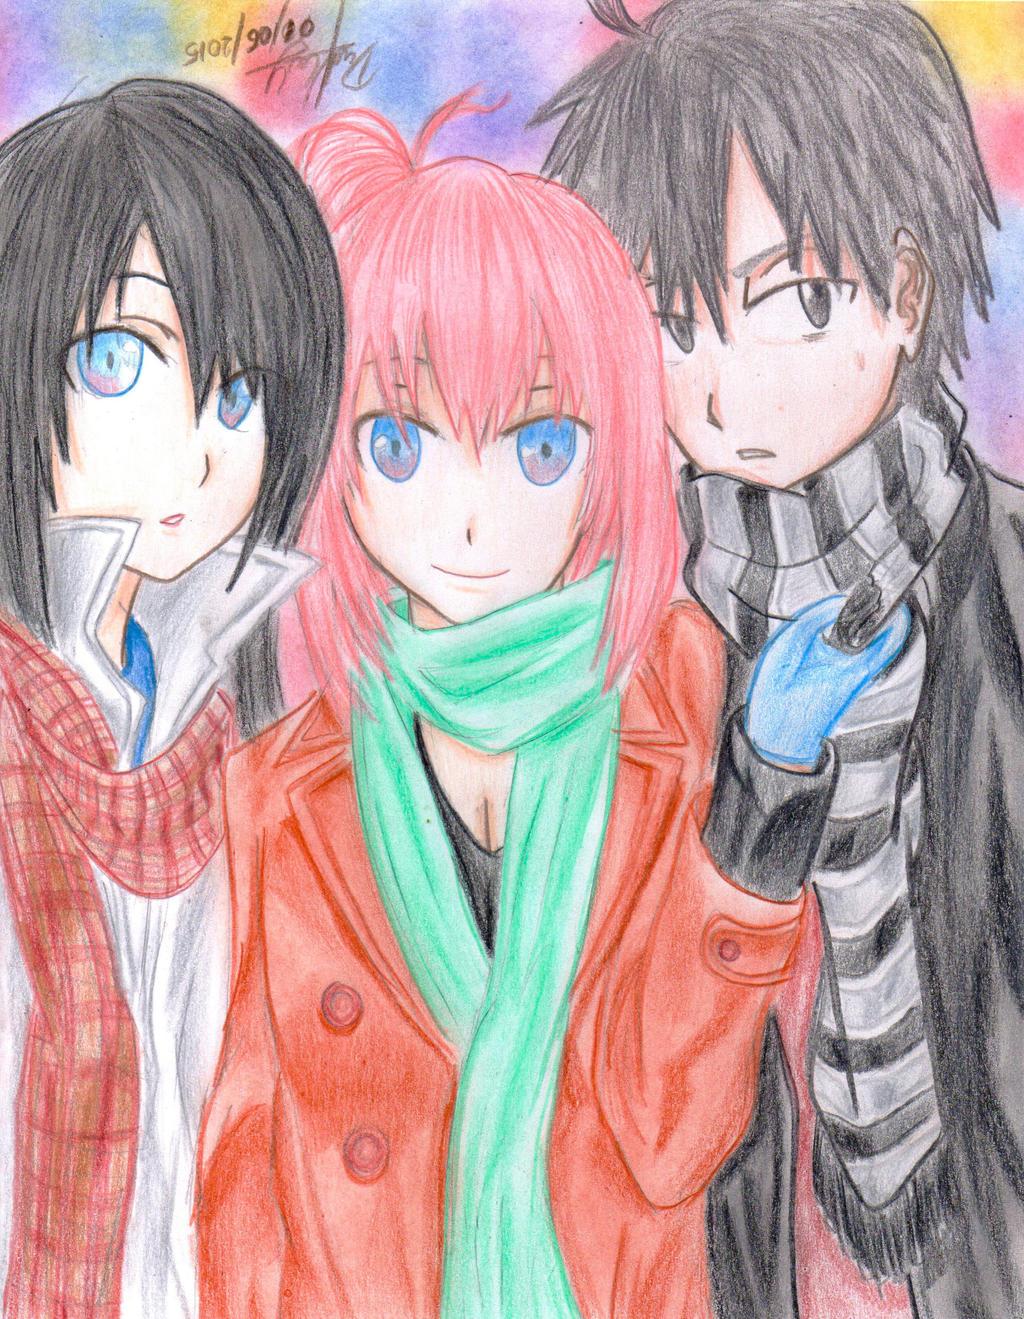 Yukino, Yui and 8man by danielcamilo